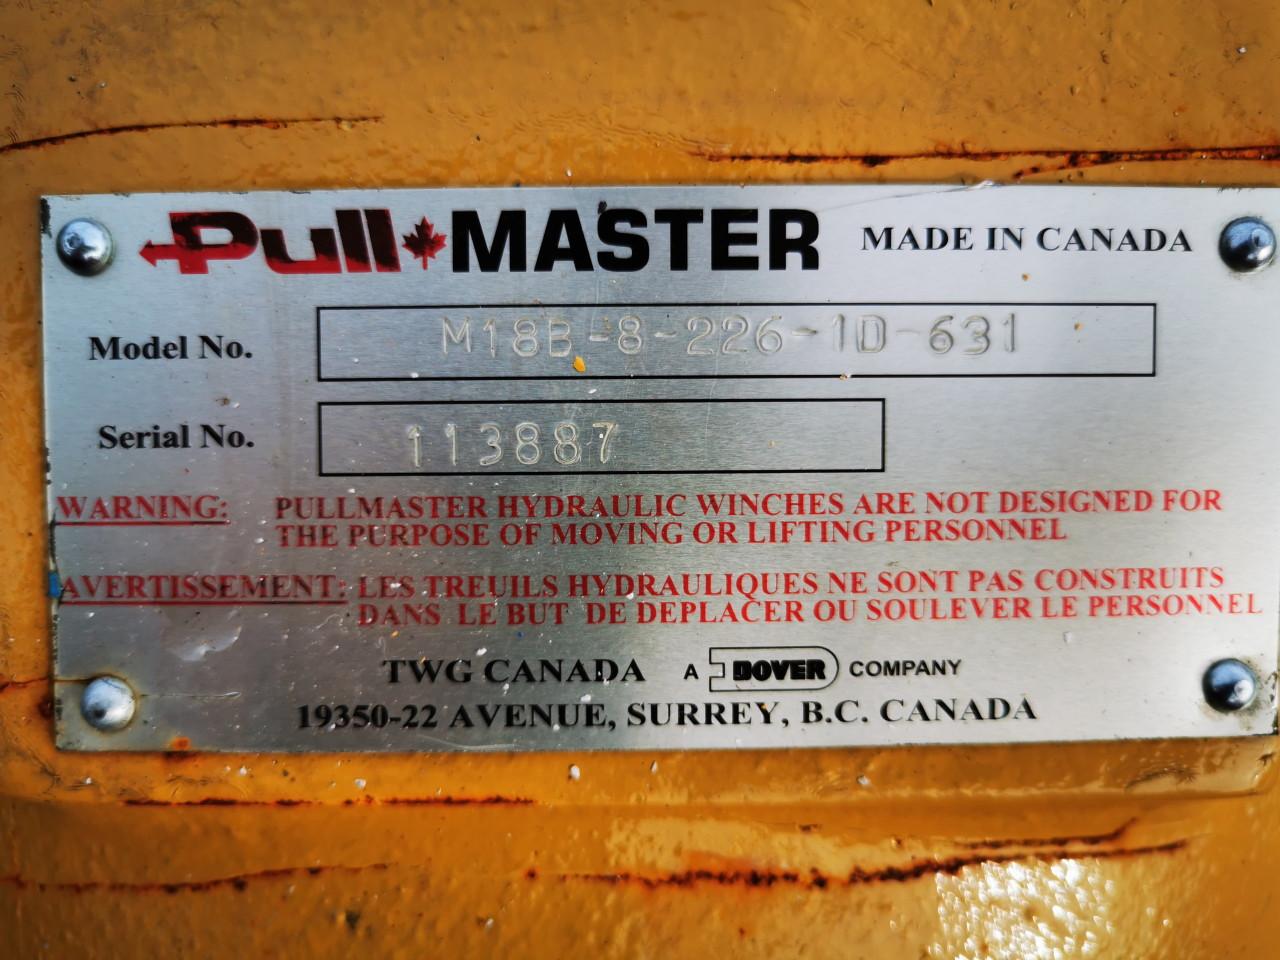 PULLMASTER FREEFALL M188